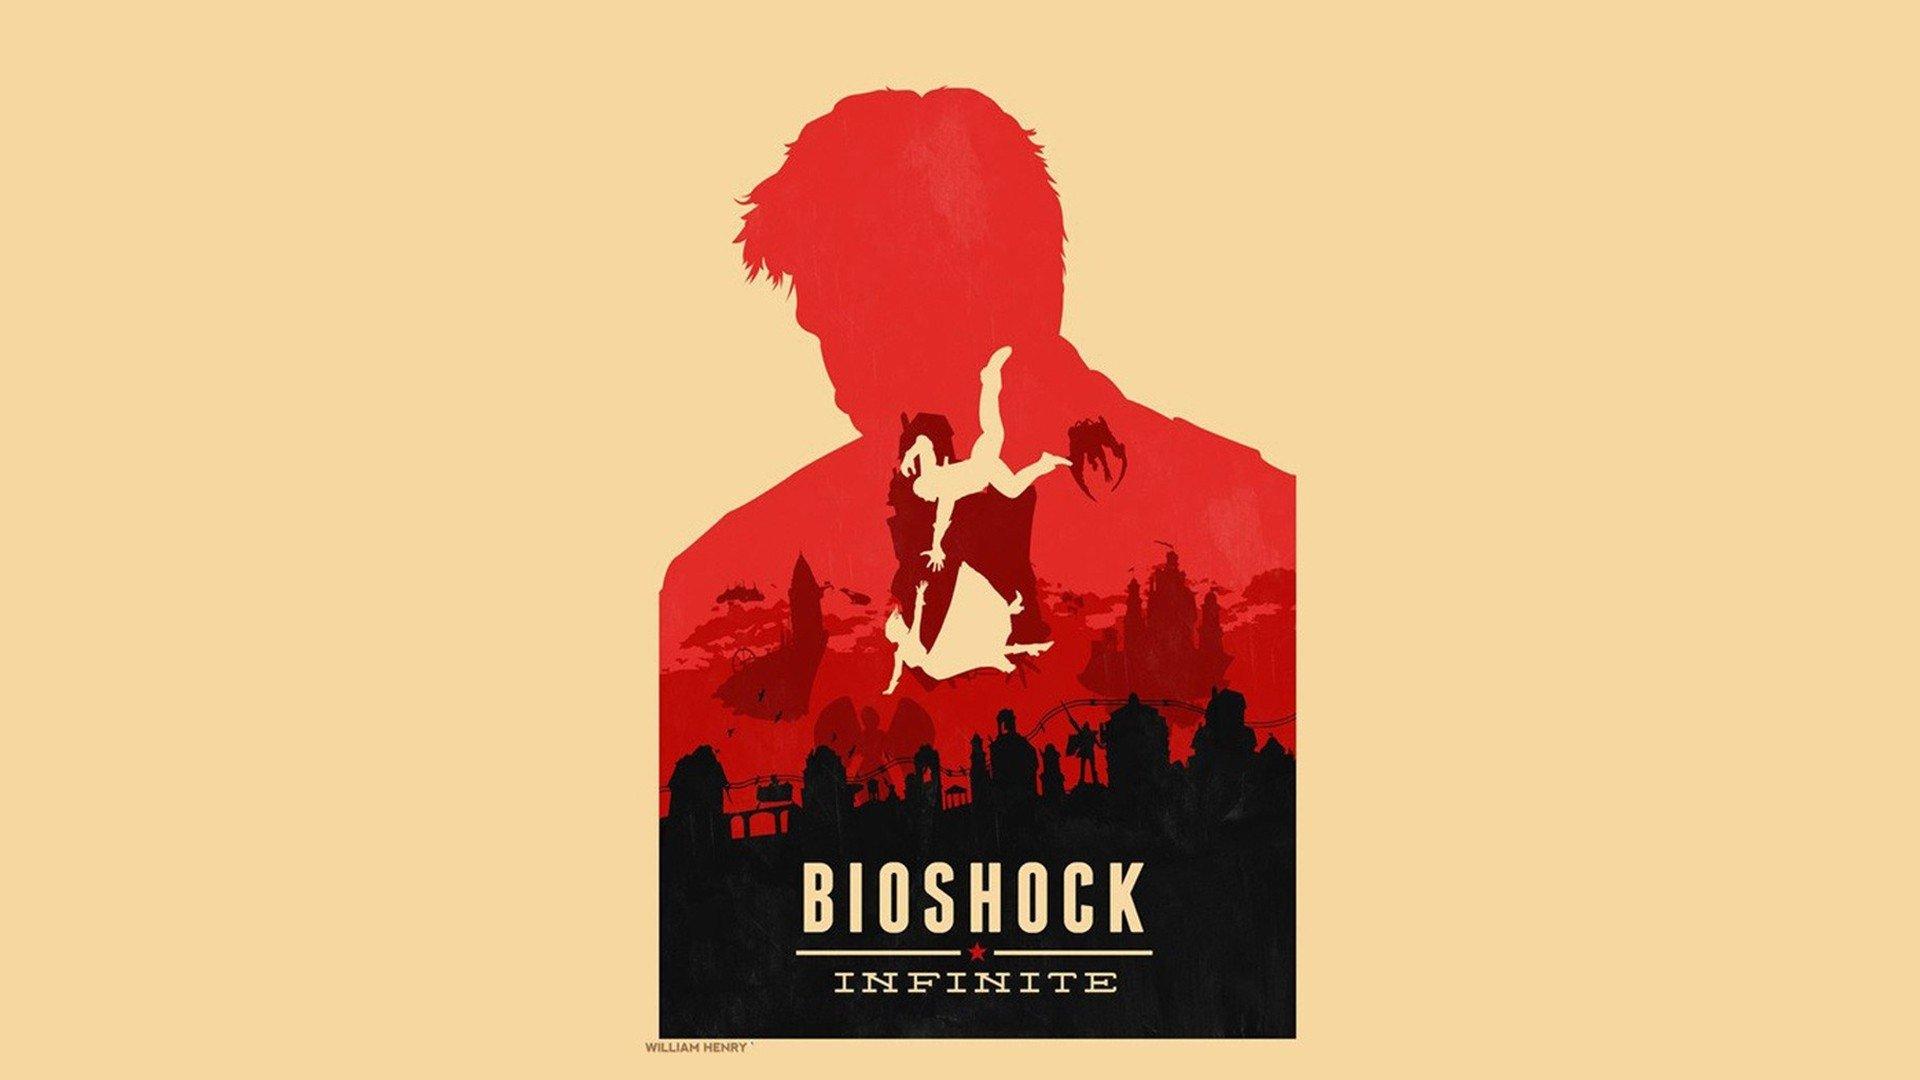 Video Game - Bioshock Infinite  Wallpaper